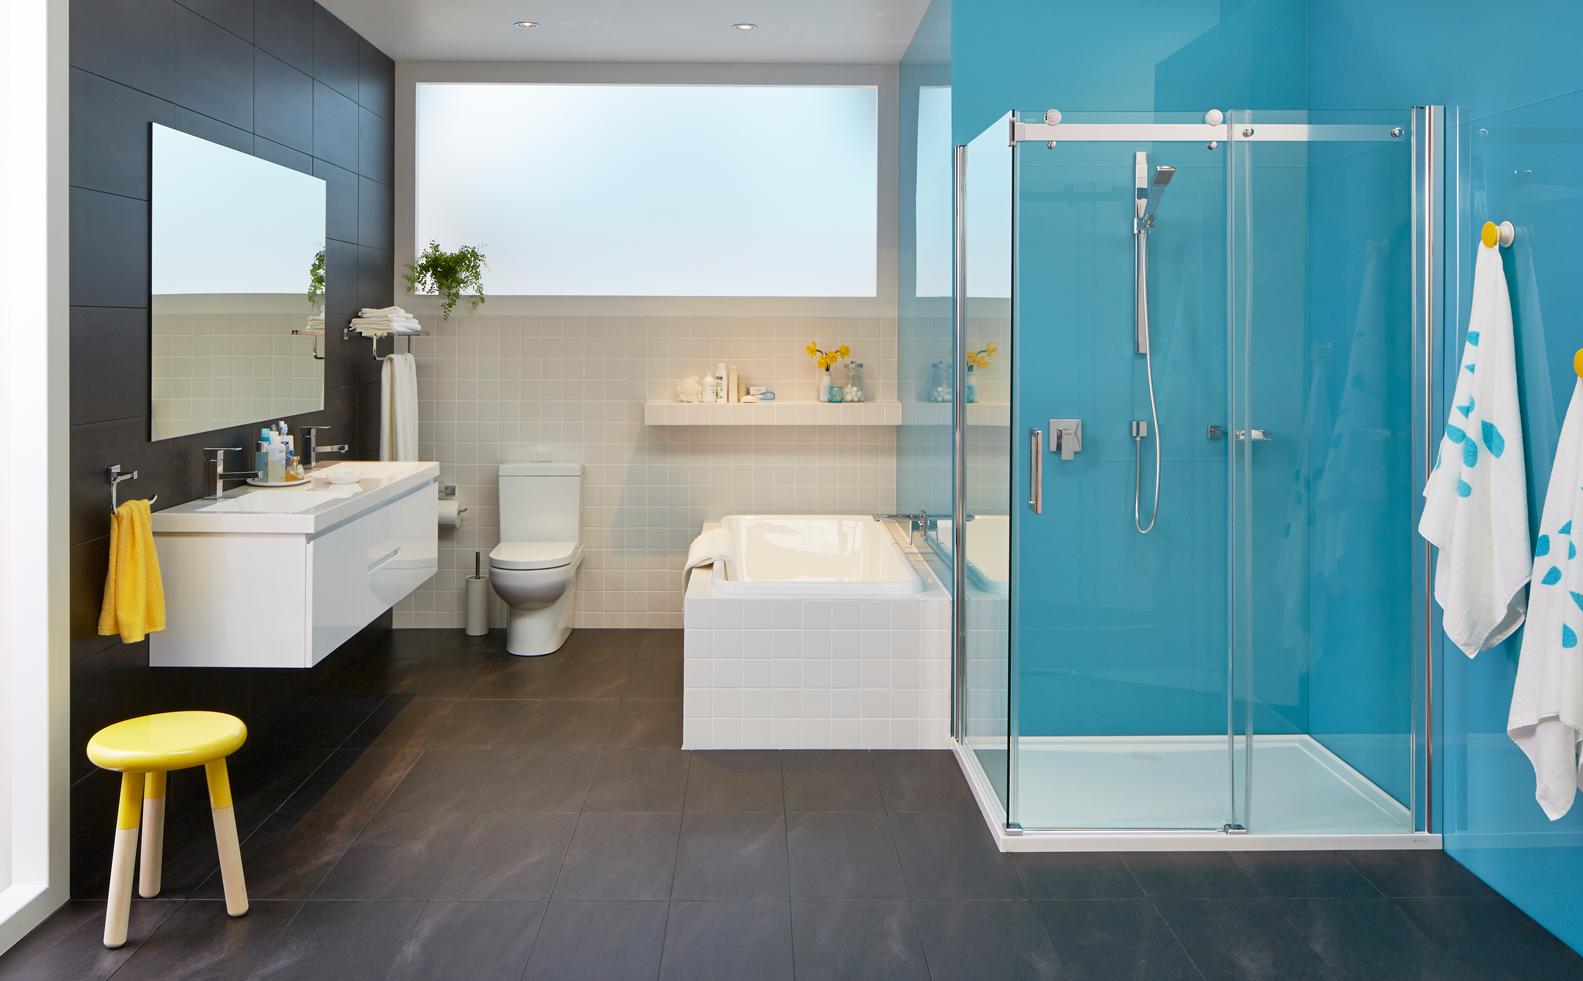 Bathroom inspiration gallery bunnings colour blue floor bathroom inspiration gallery bunnings colour blue floor tiles dailygadgetfo Choice Image